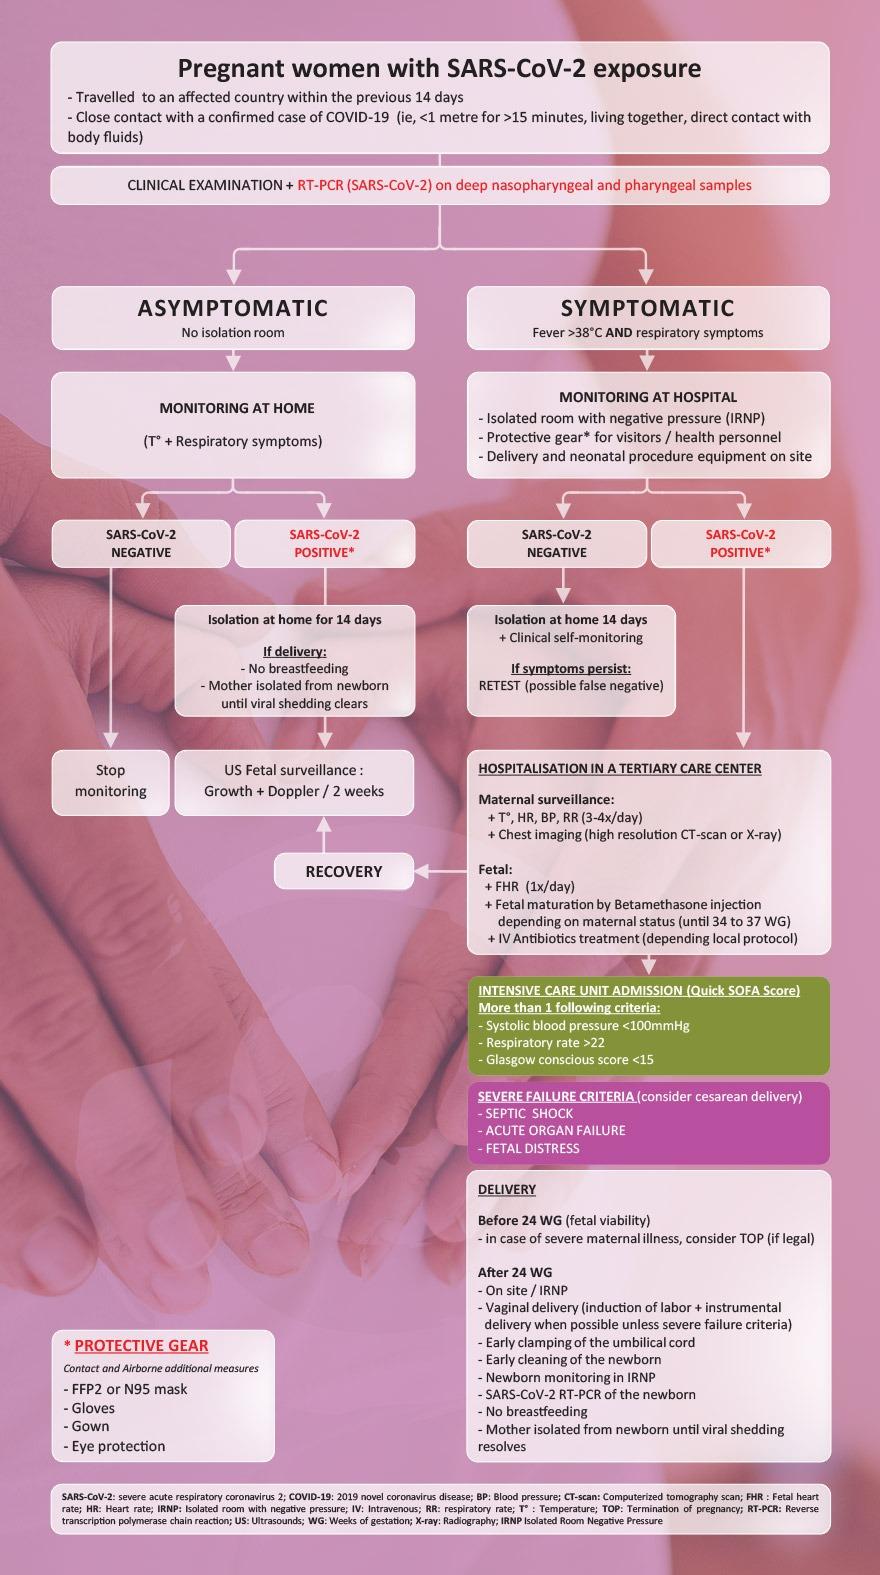 ivf-Corona-guideline-flowchart